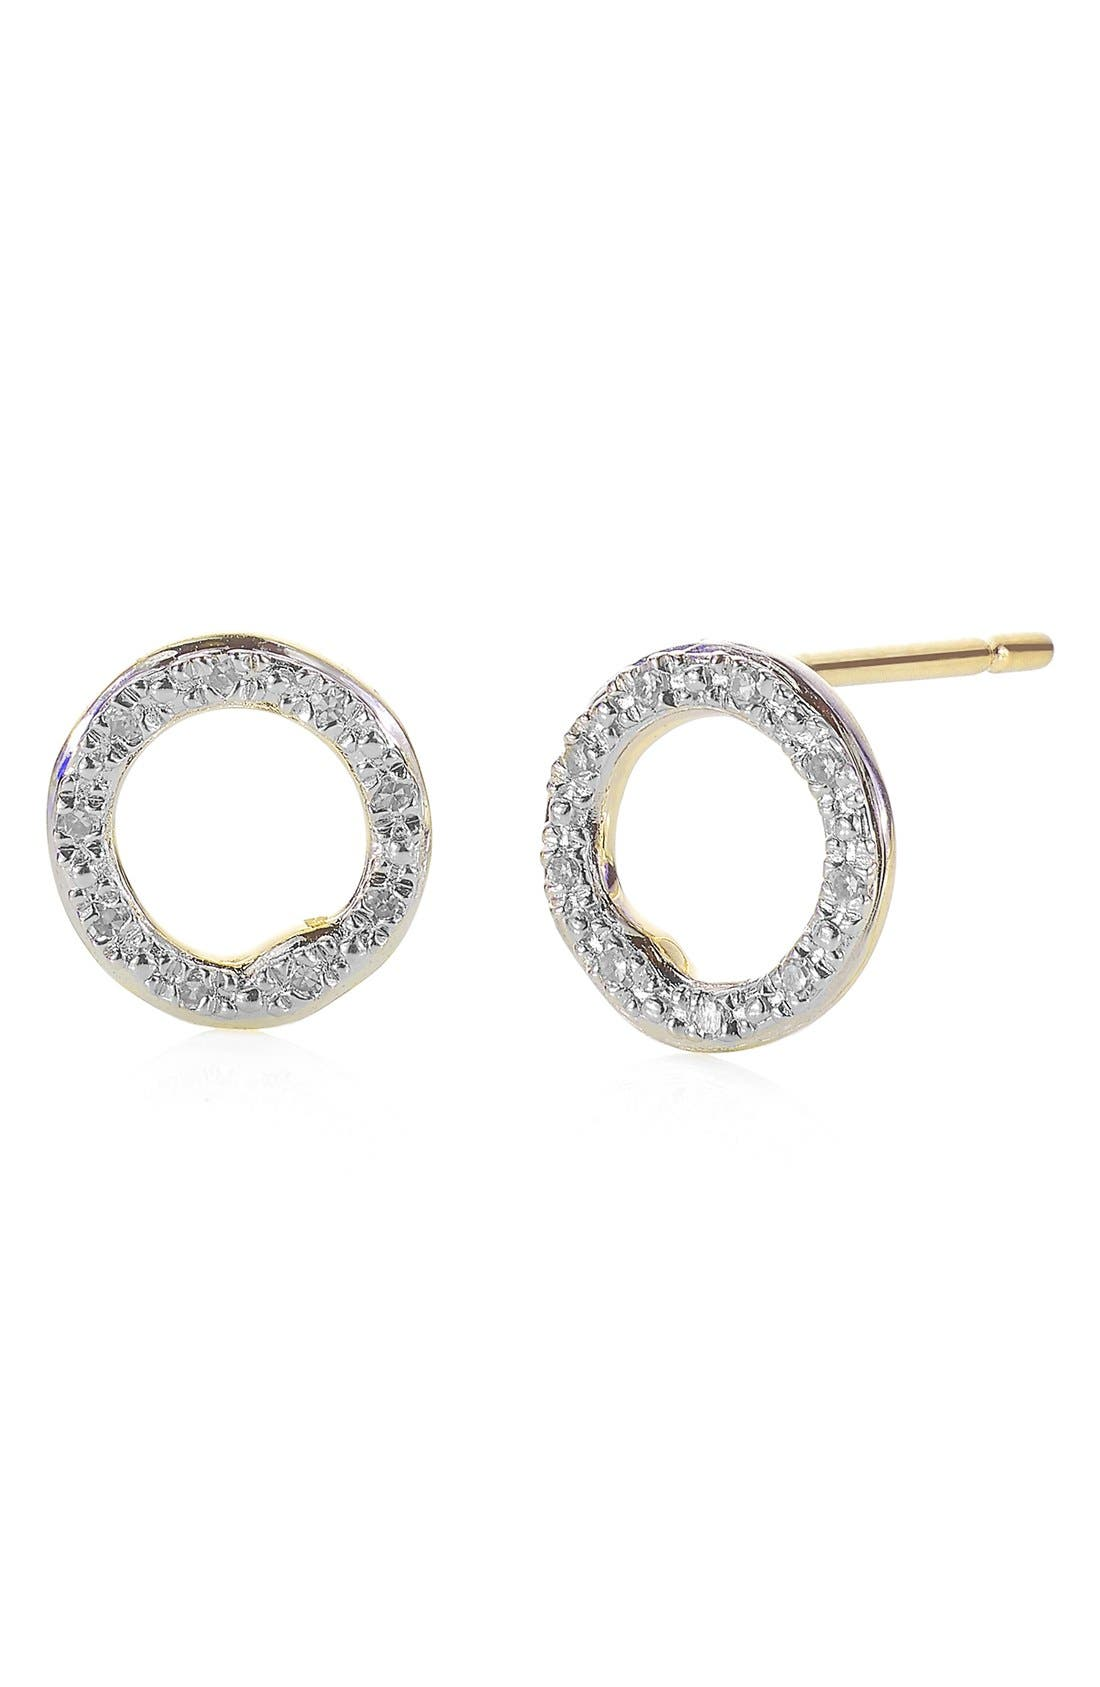 Main Image - Monica Vinader 'Riva' Circle Stud Diamond Earrings